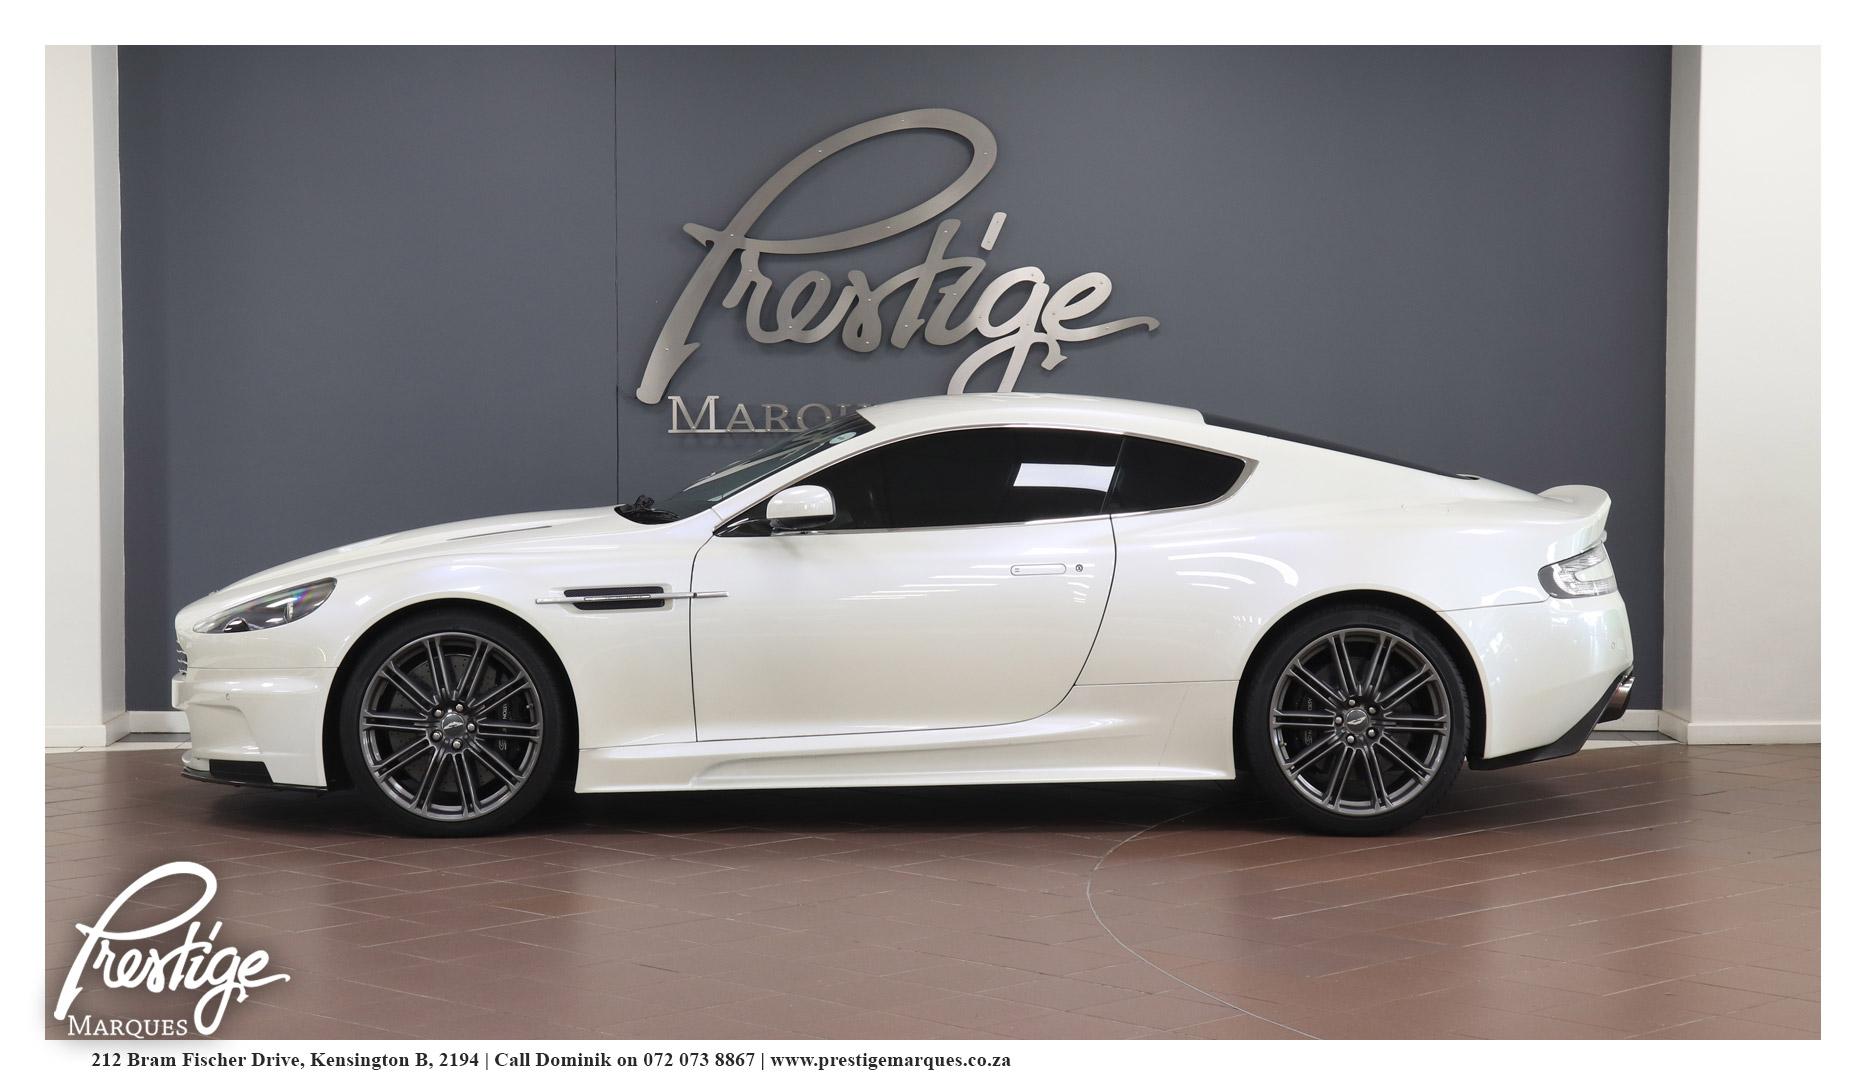 Aston-Martin-DBS-Coupe-Auto-2009-Prestige-Marques-Randburg-Sandton-7